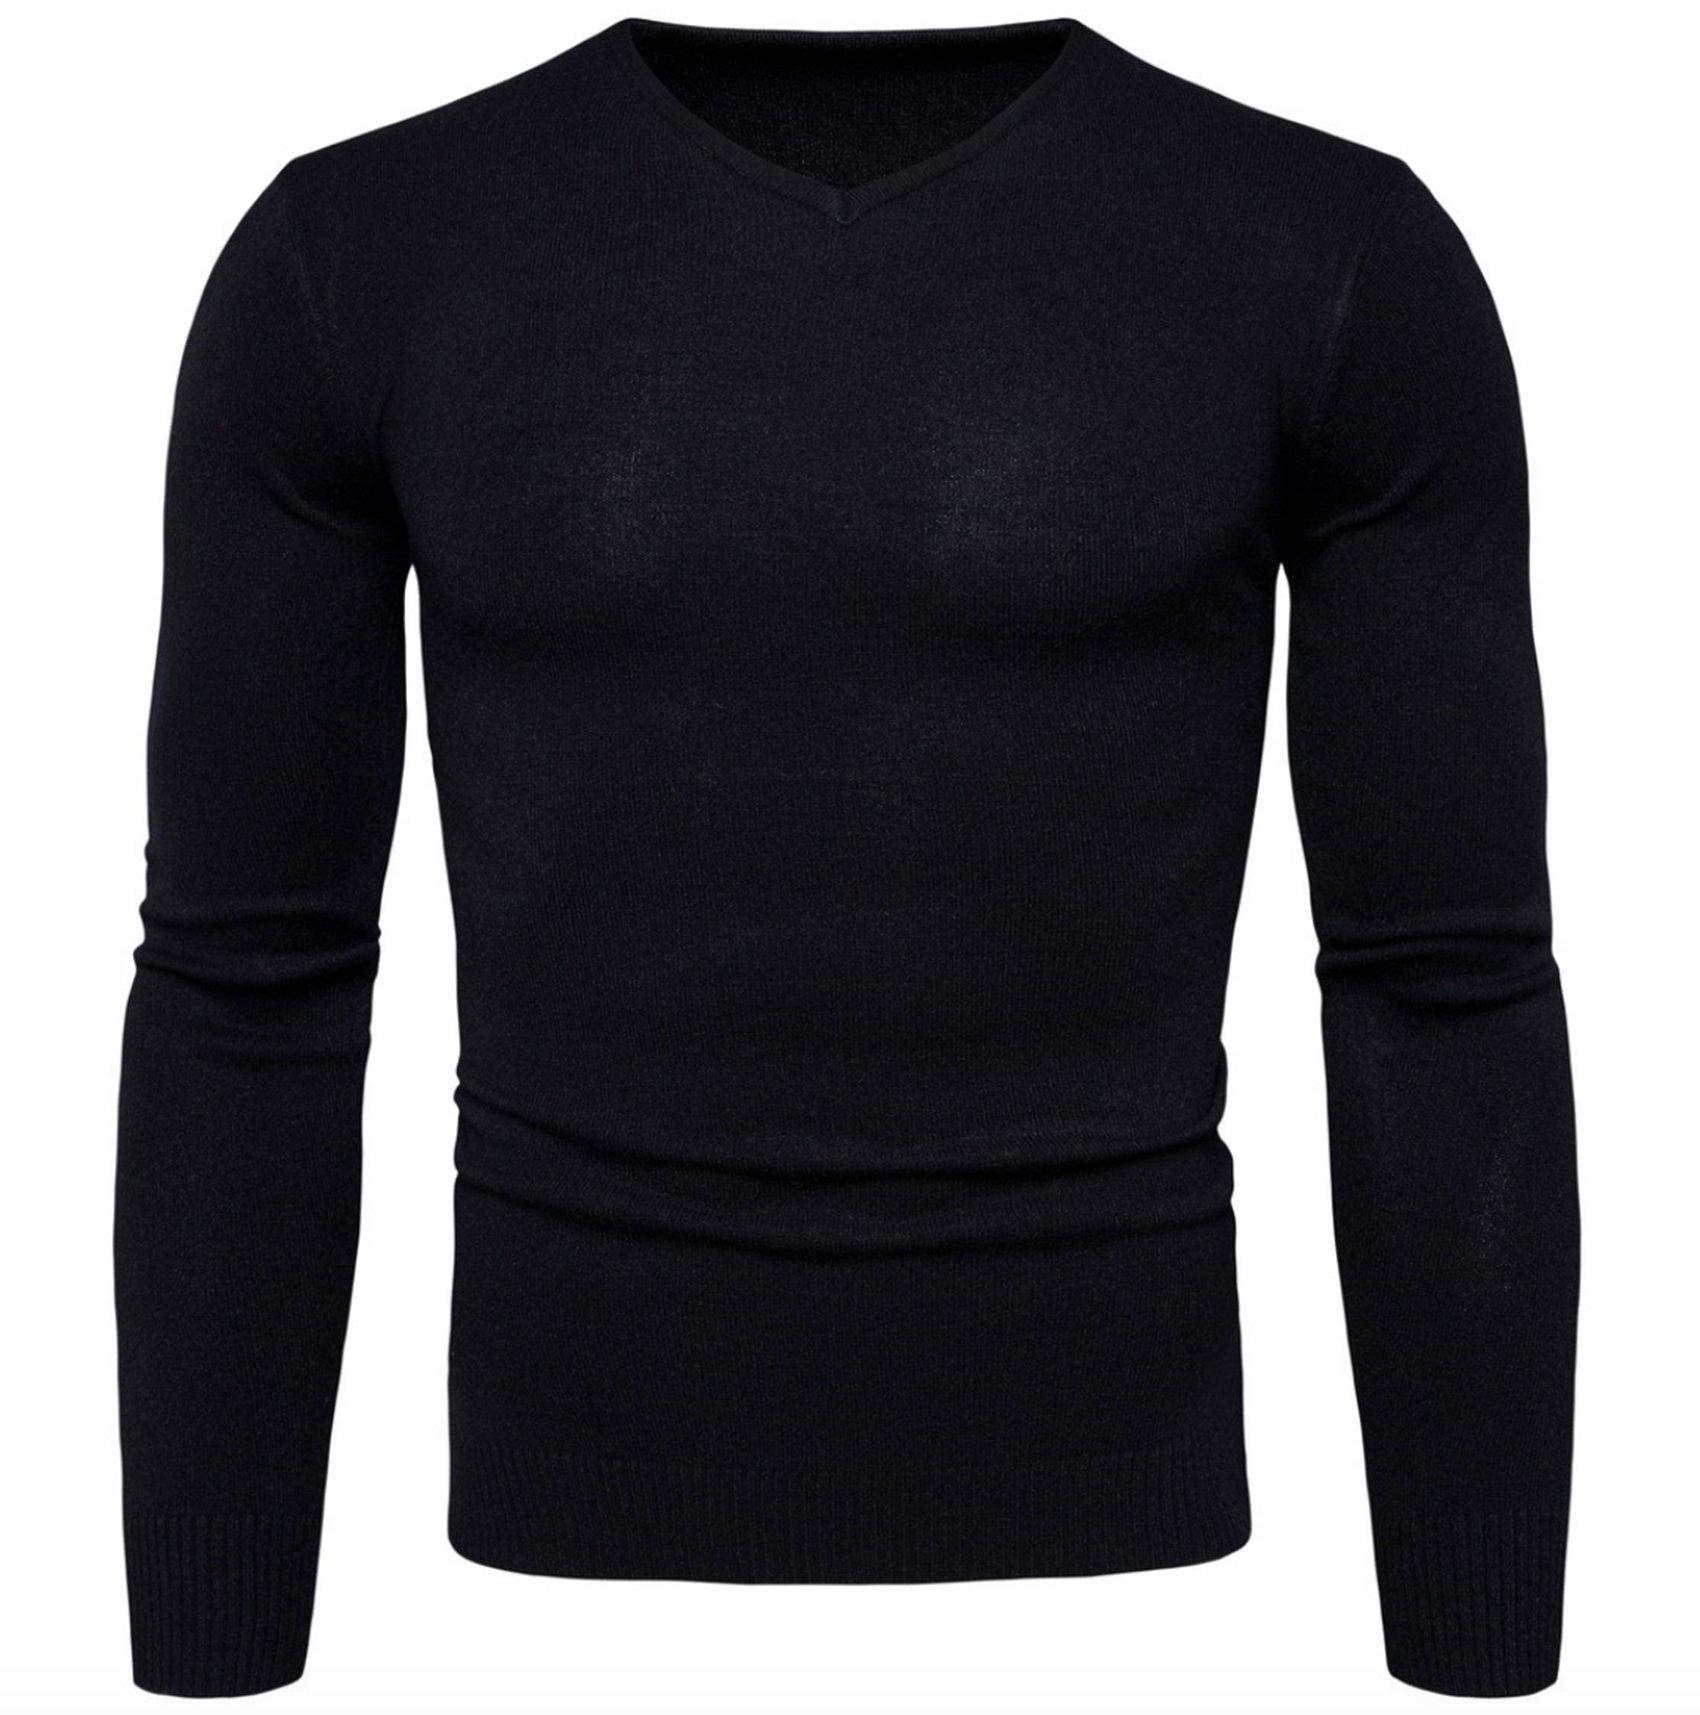 Elonglin Mens V-Neck Sweater Knit Fine Coton Classic Jumper Pullover Slim Fit Black US XS (Asian M)